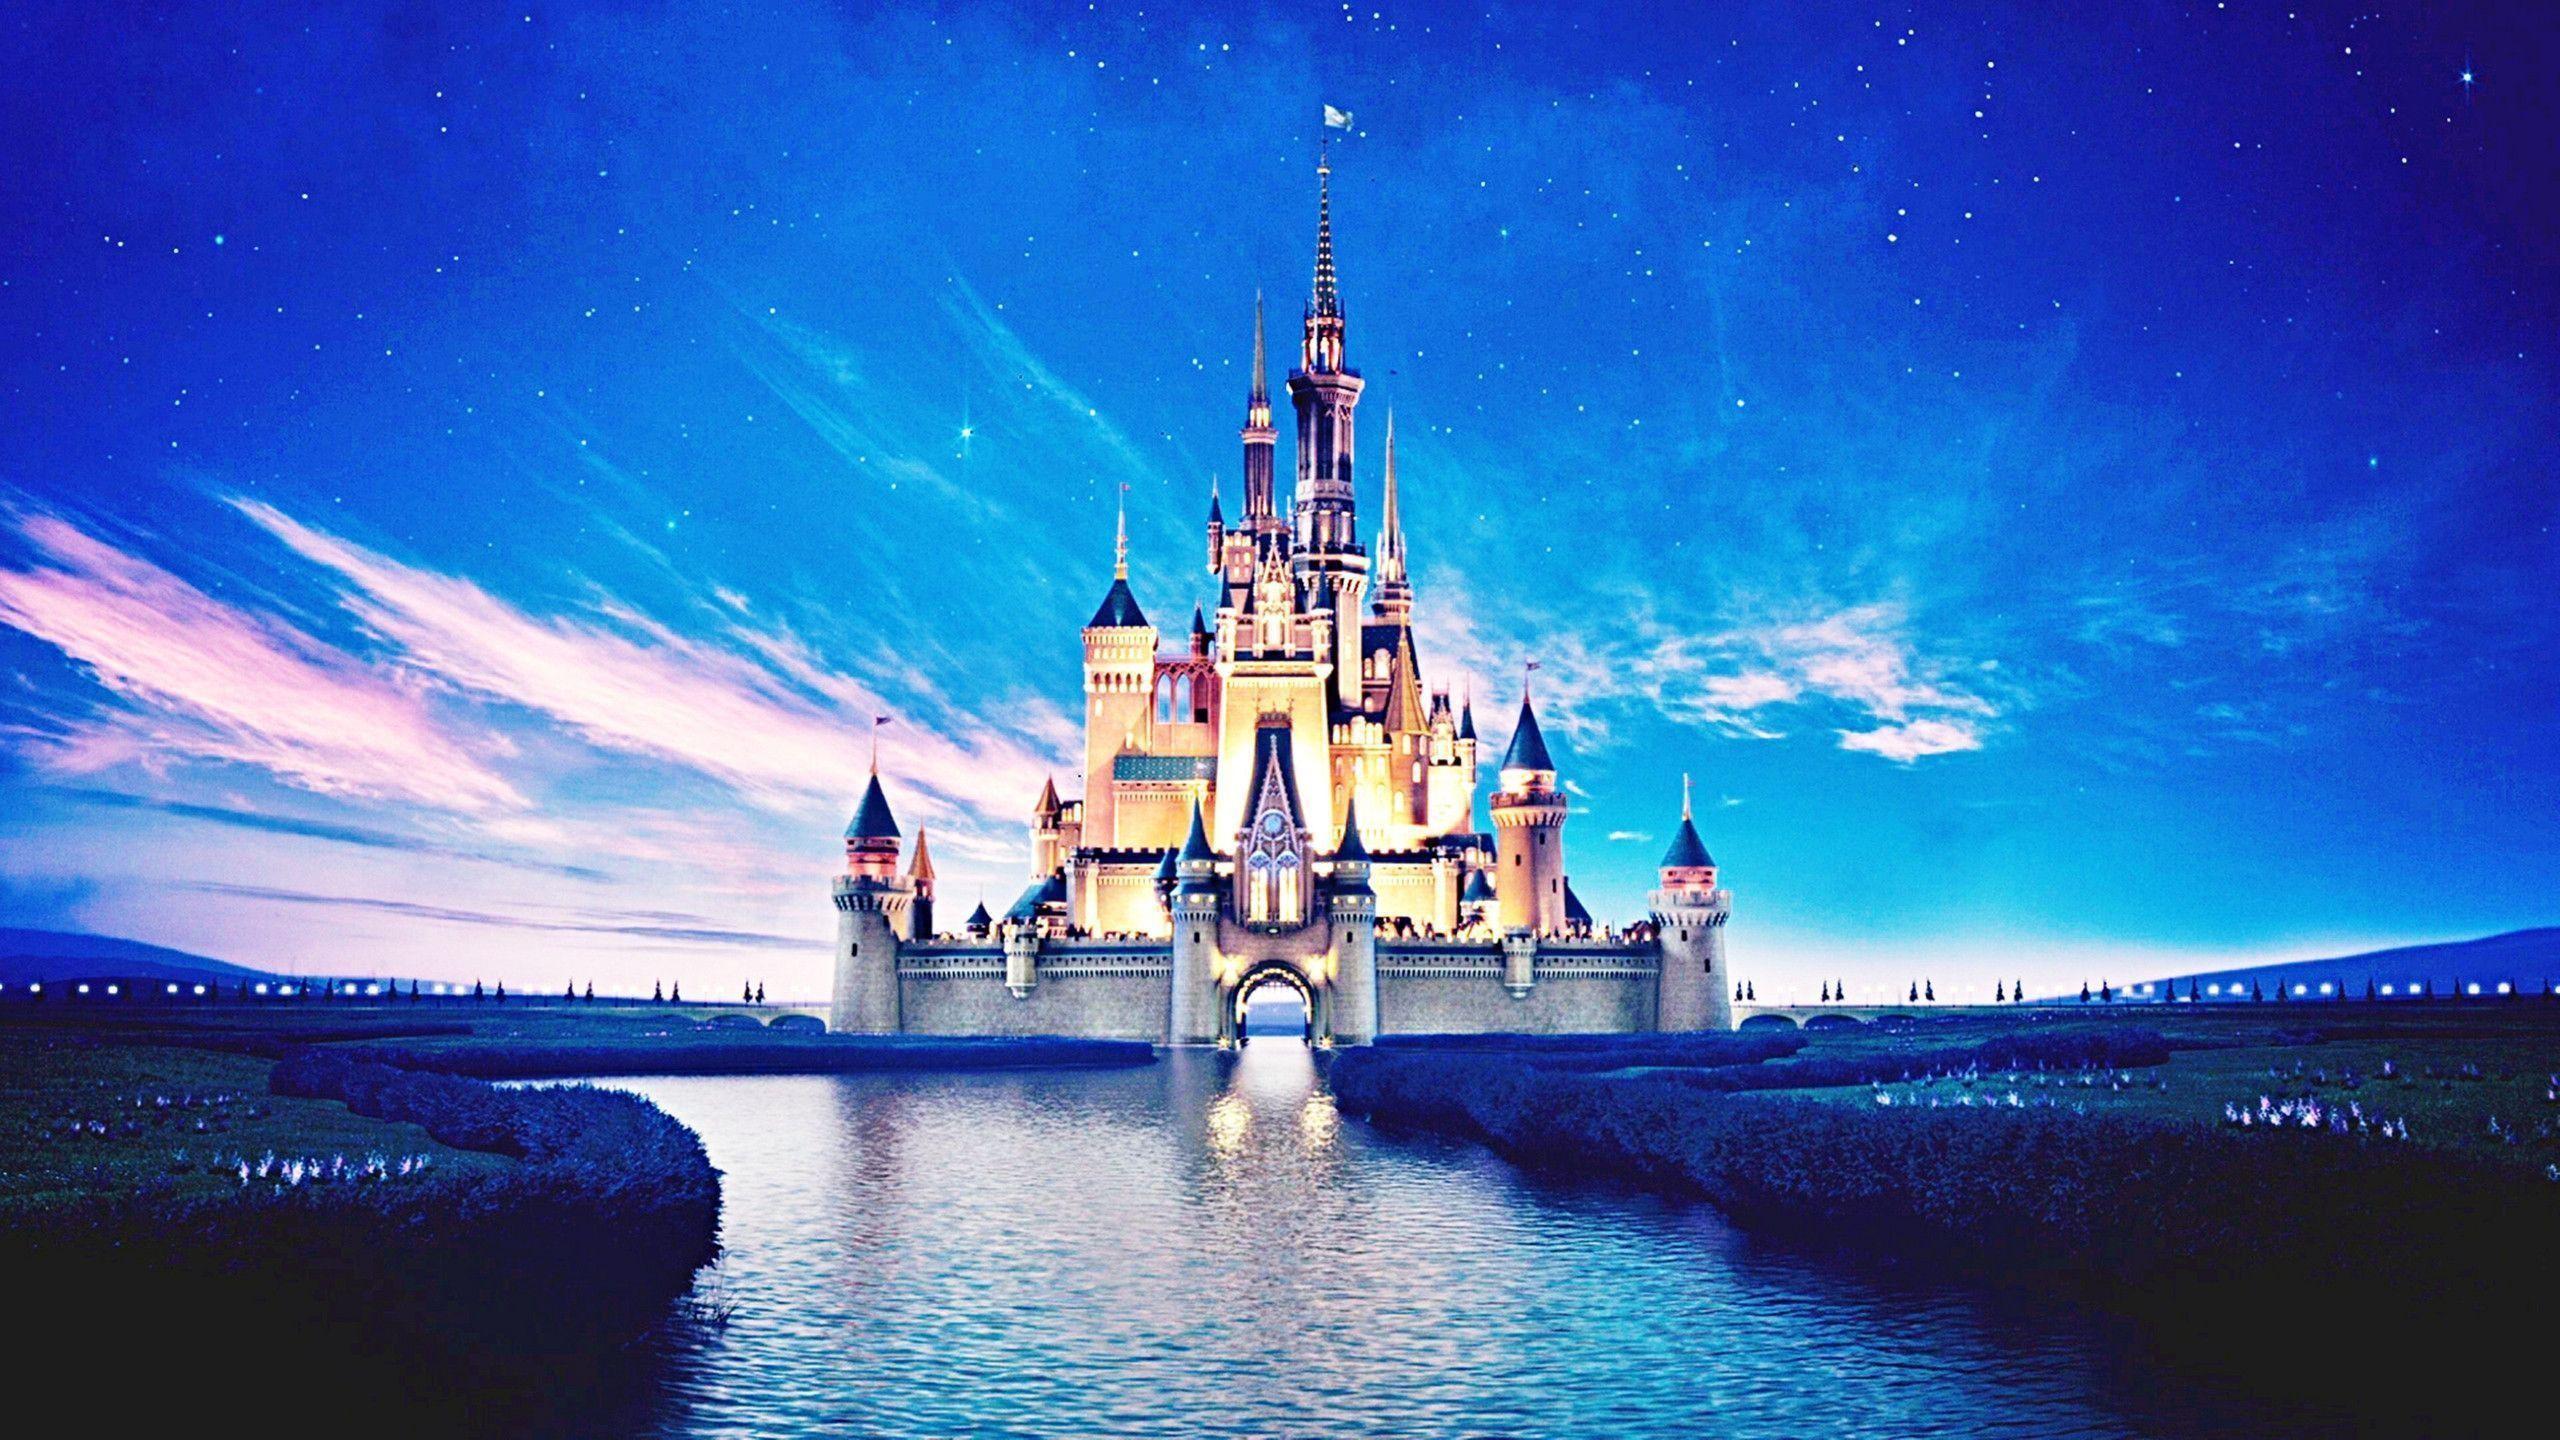 Best 25 Wallpaper Iphone Disney ideas on Pinterest   Disney .